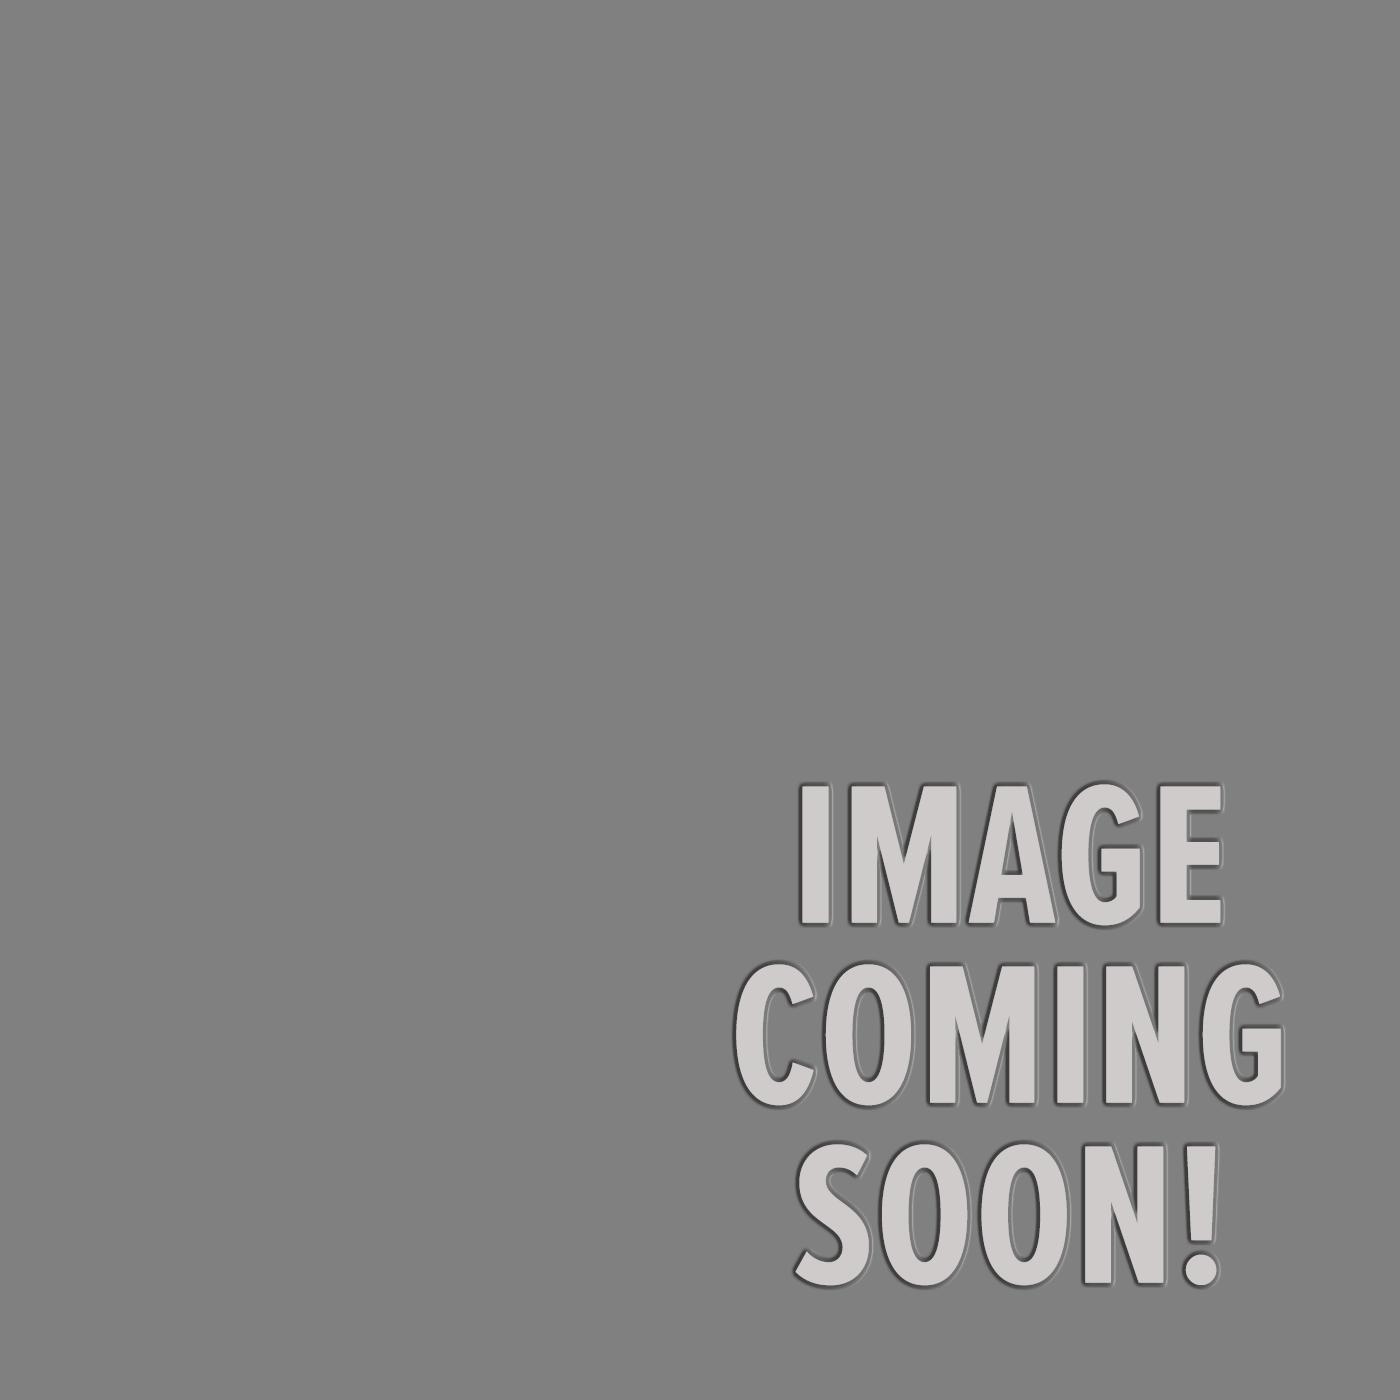 D'Addario EXL116 Nickel Wound Electric Guitar Strings, Medium Top Heavy Bottom, 11-52